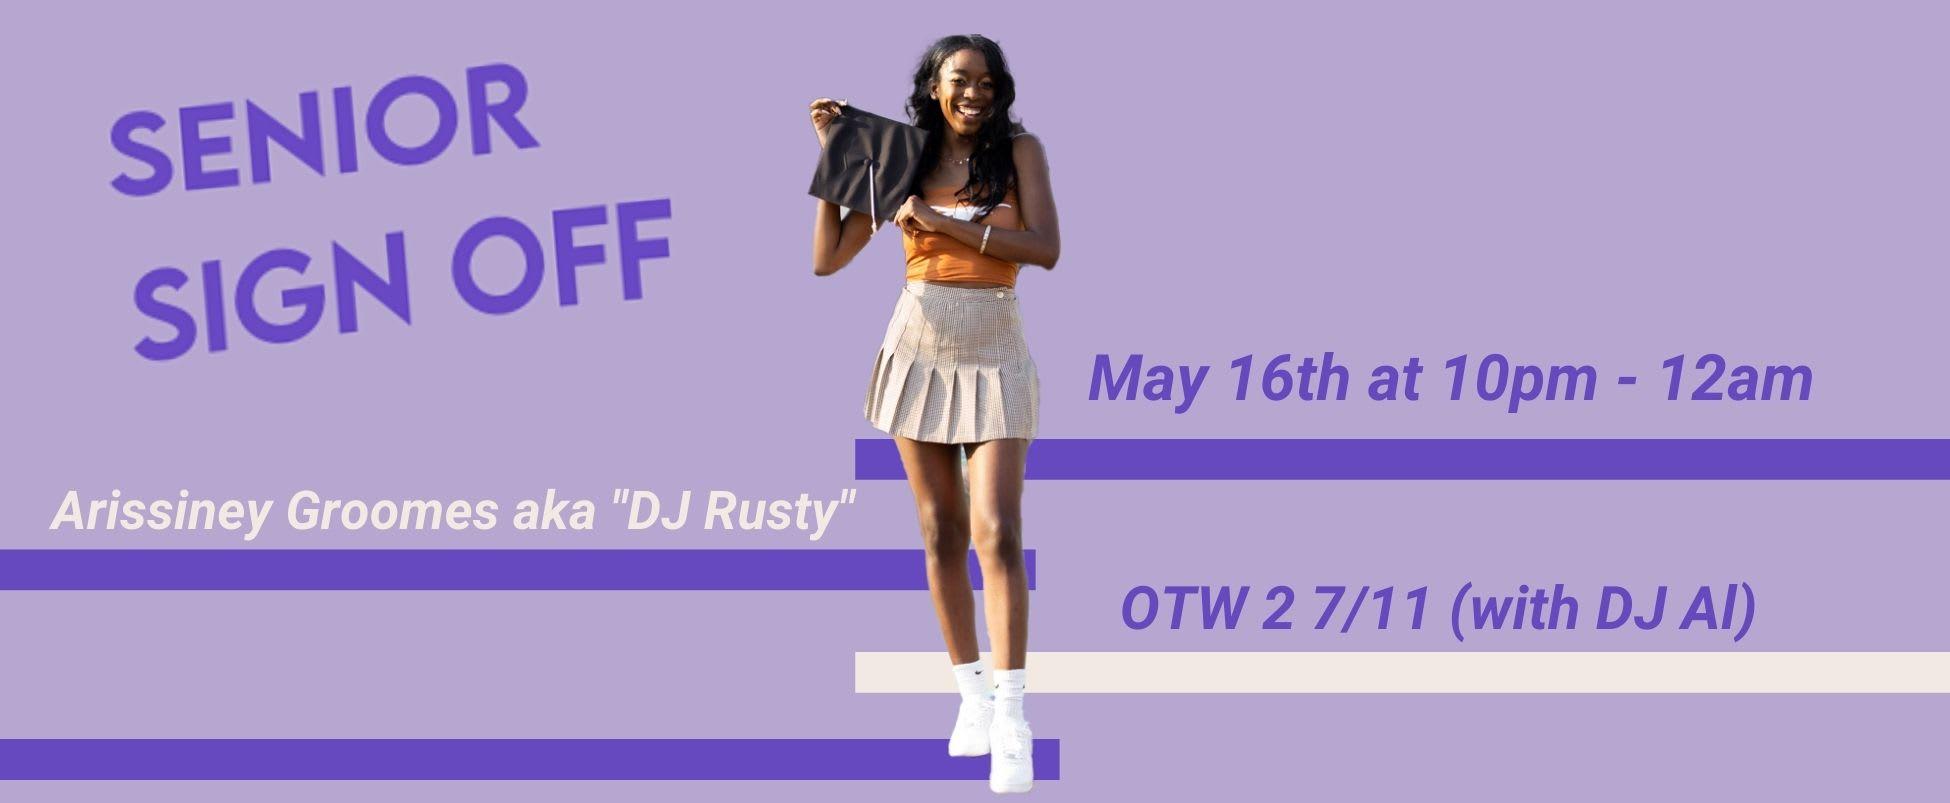 Senior Sign-Off: DJ Rusty